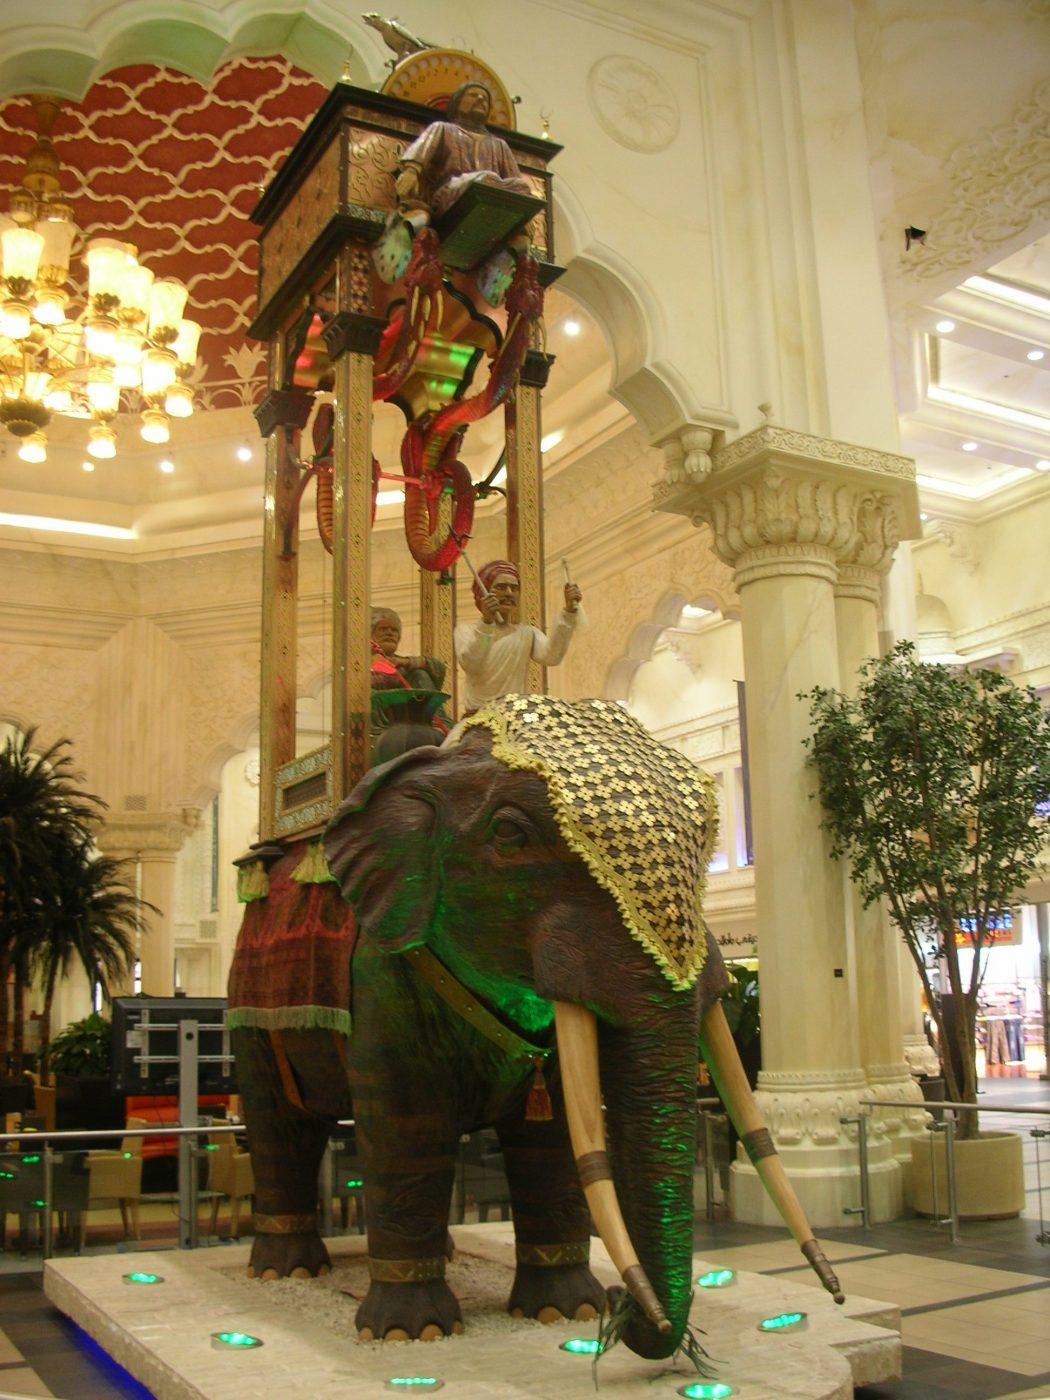 Elephant_clock_Dubai Top 10 Muslim Inventions